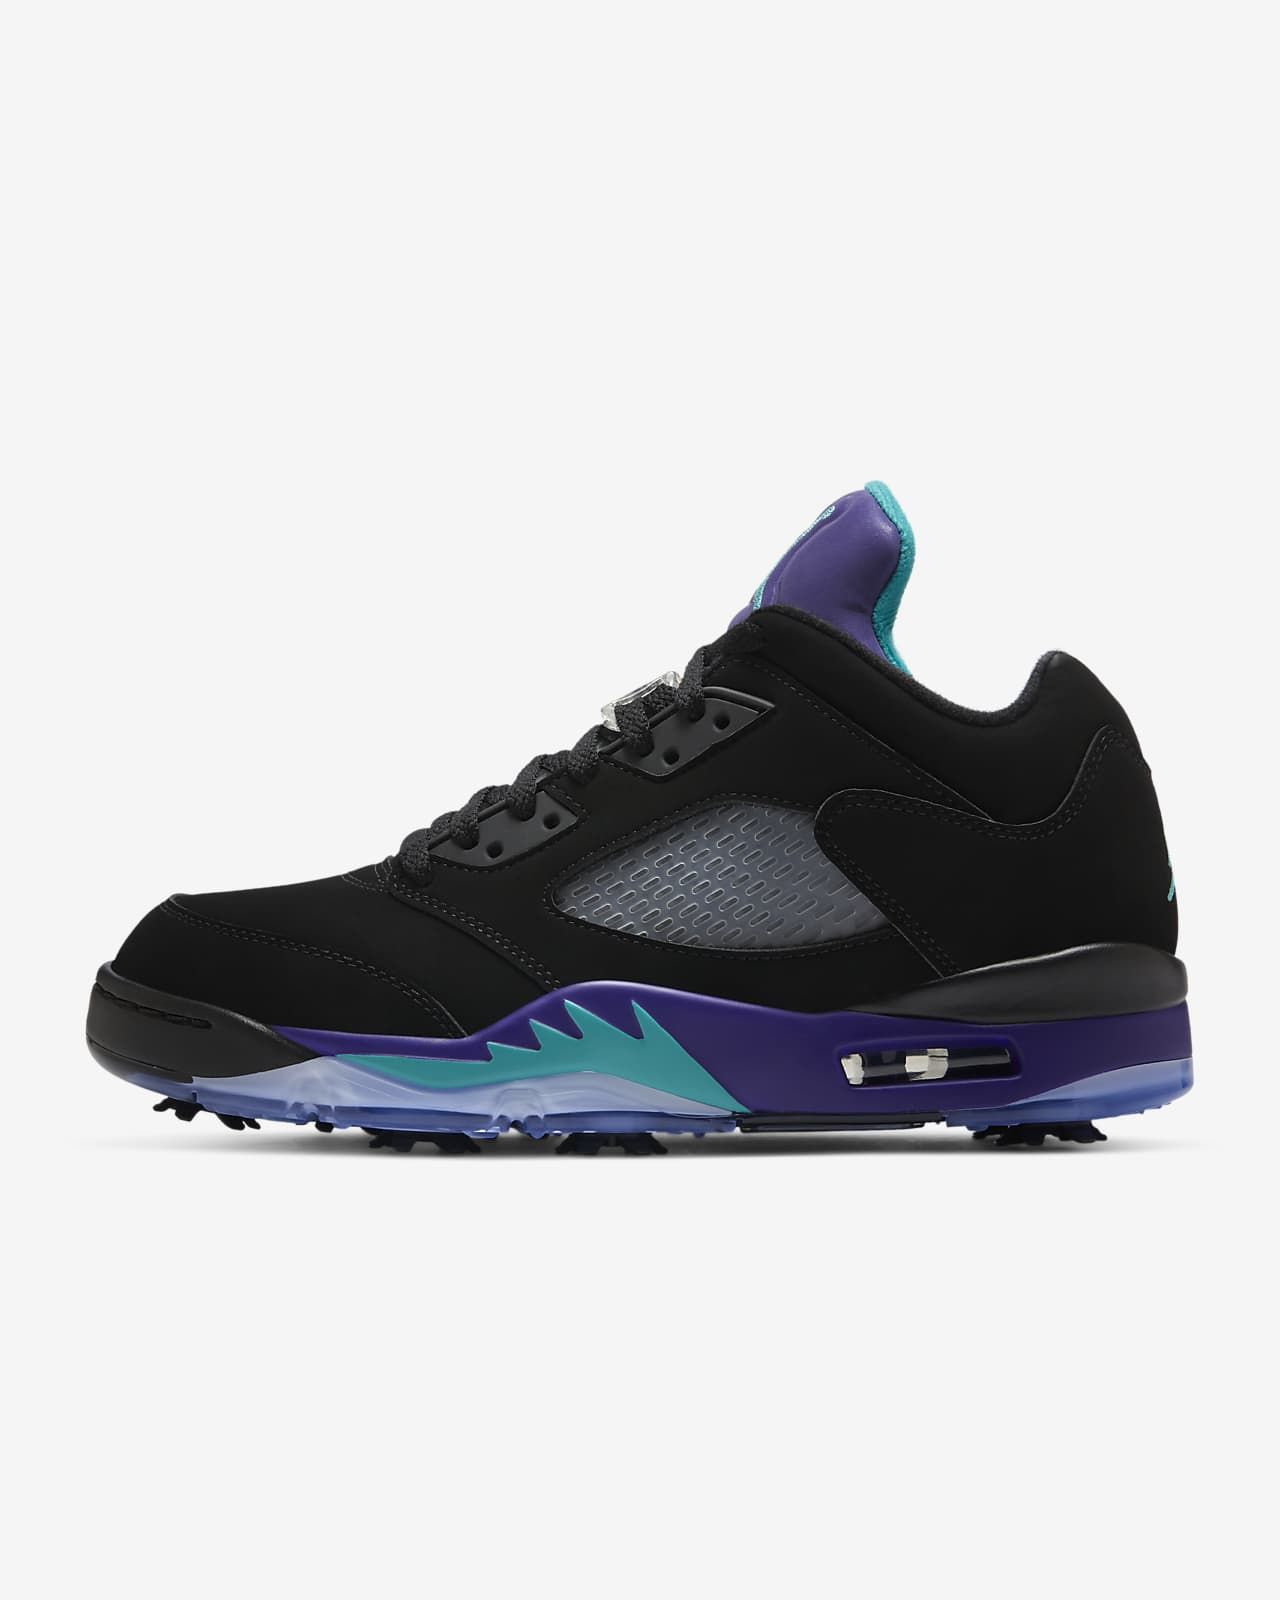 Air Jordan V Low Golf Shoe. Nike NZ